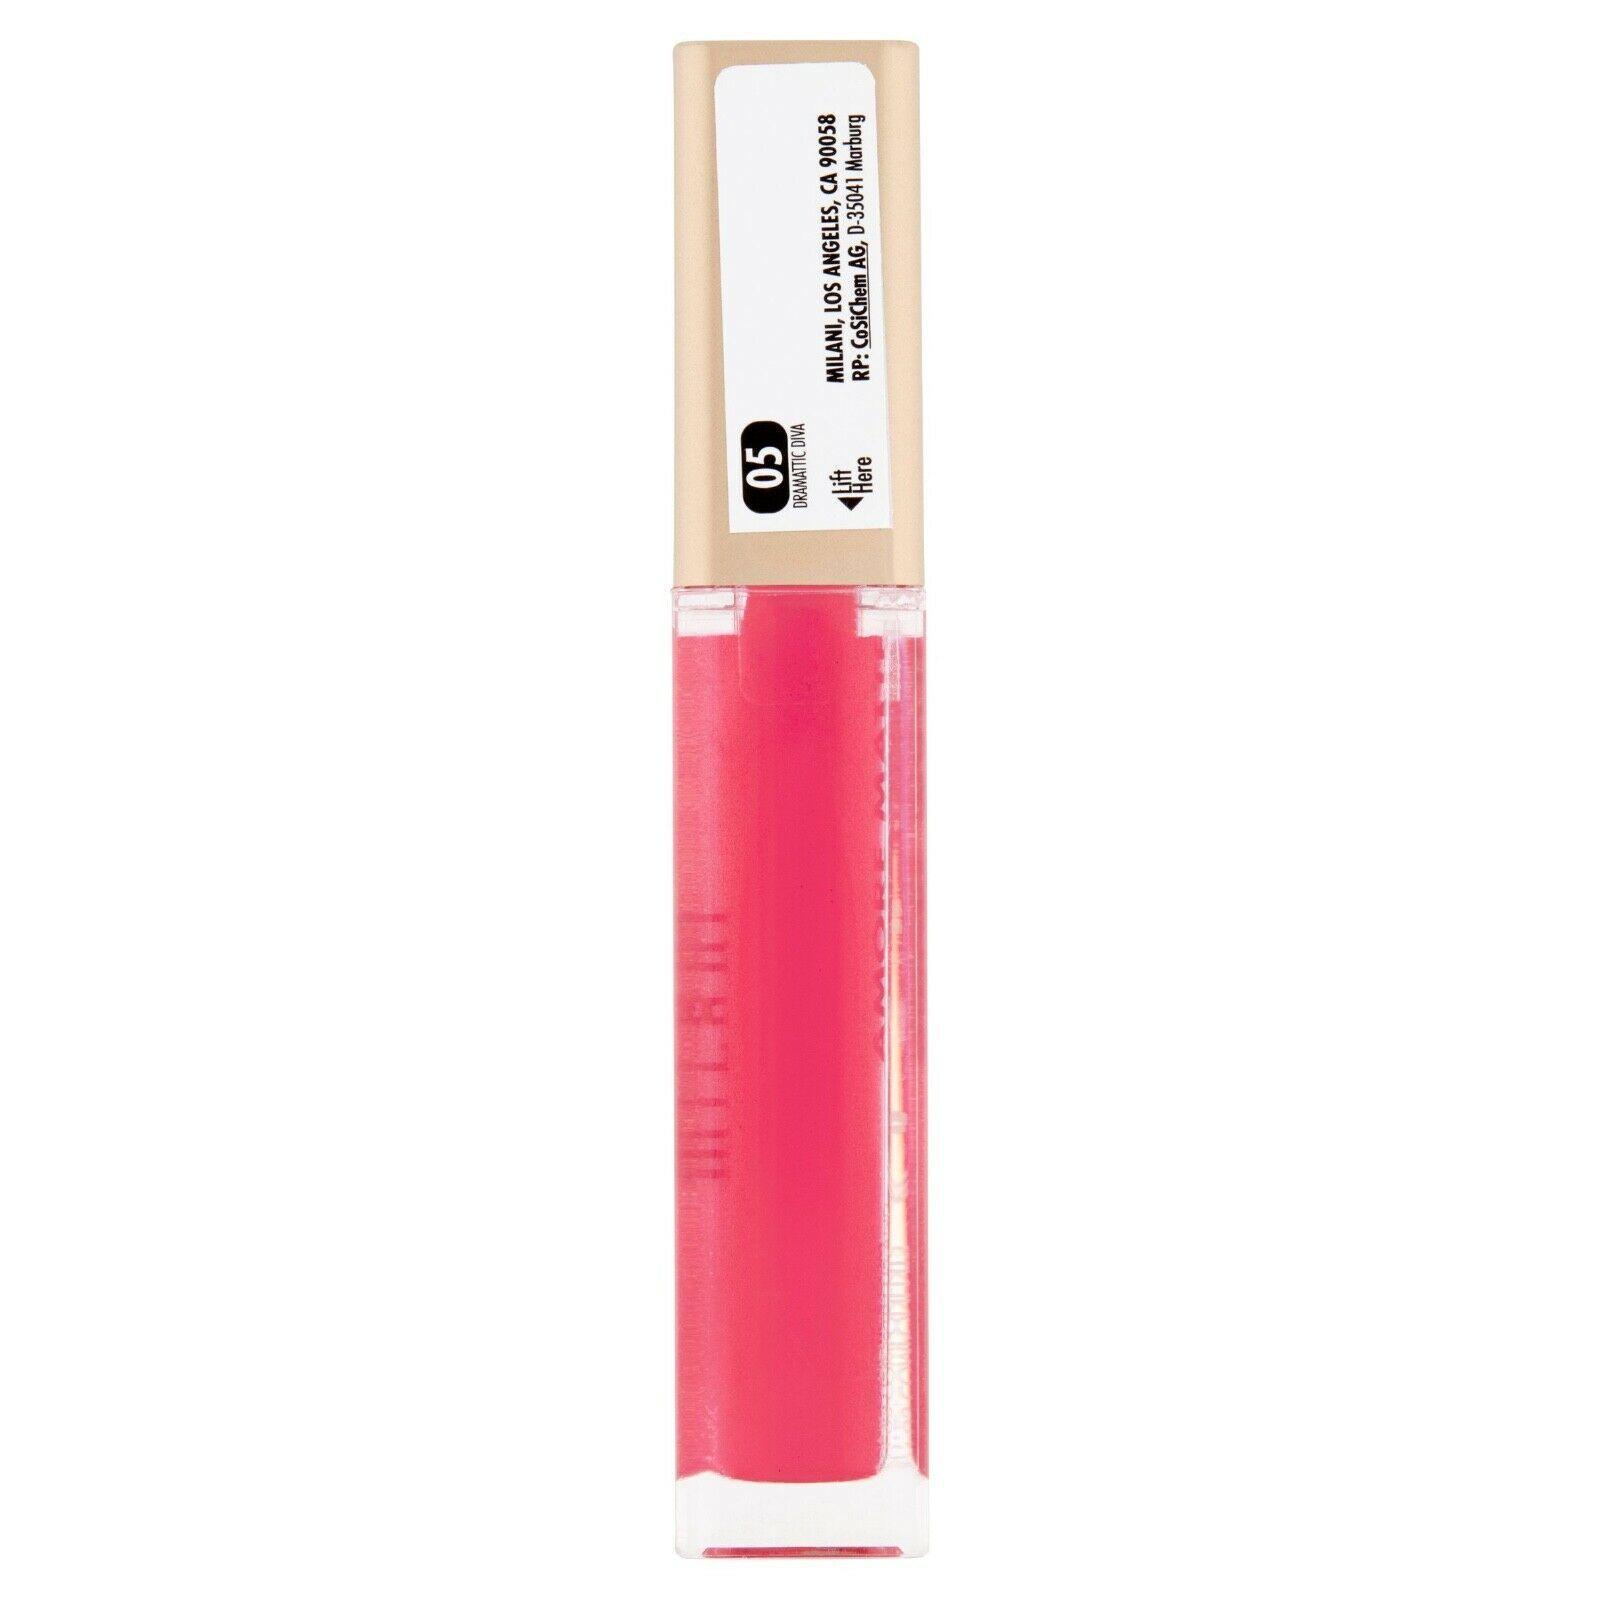 Milani Amore Metallics Matte Liquid Lip Creme, mattallics #05 DRAMATIC DIVA  - $5.86